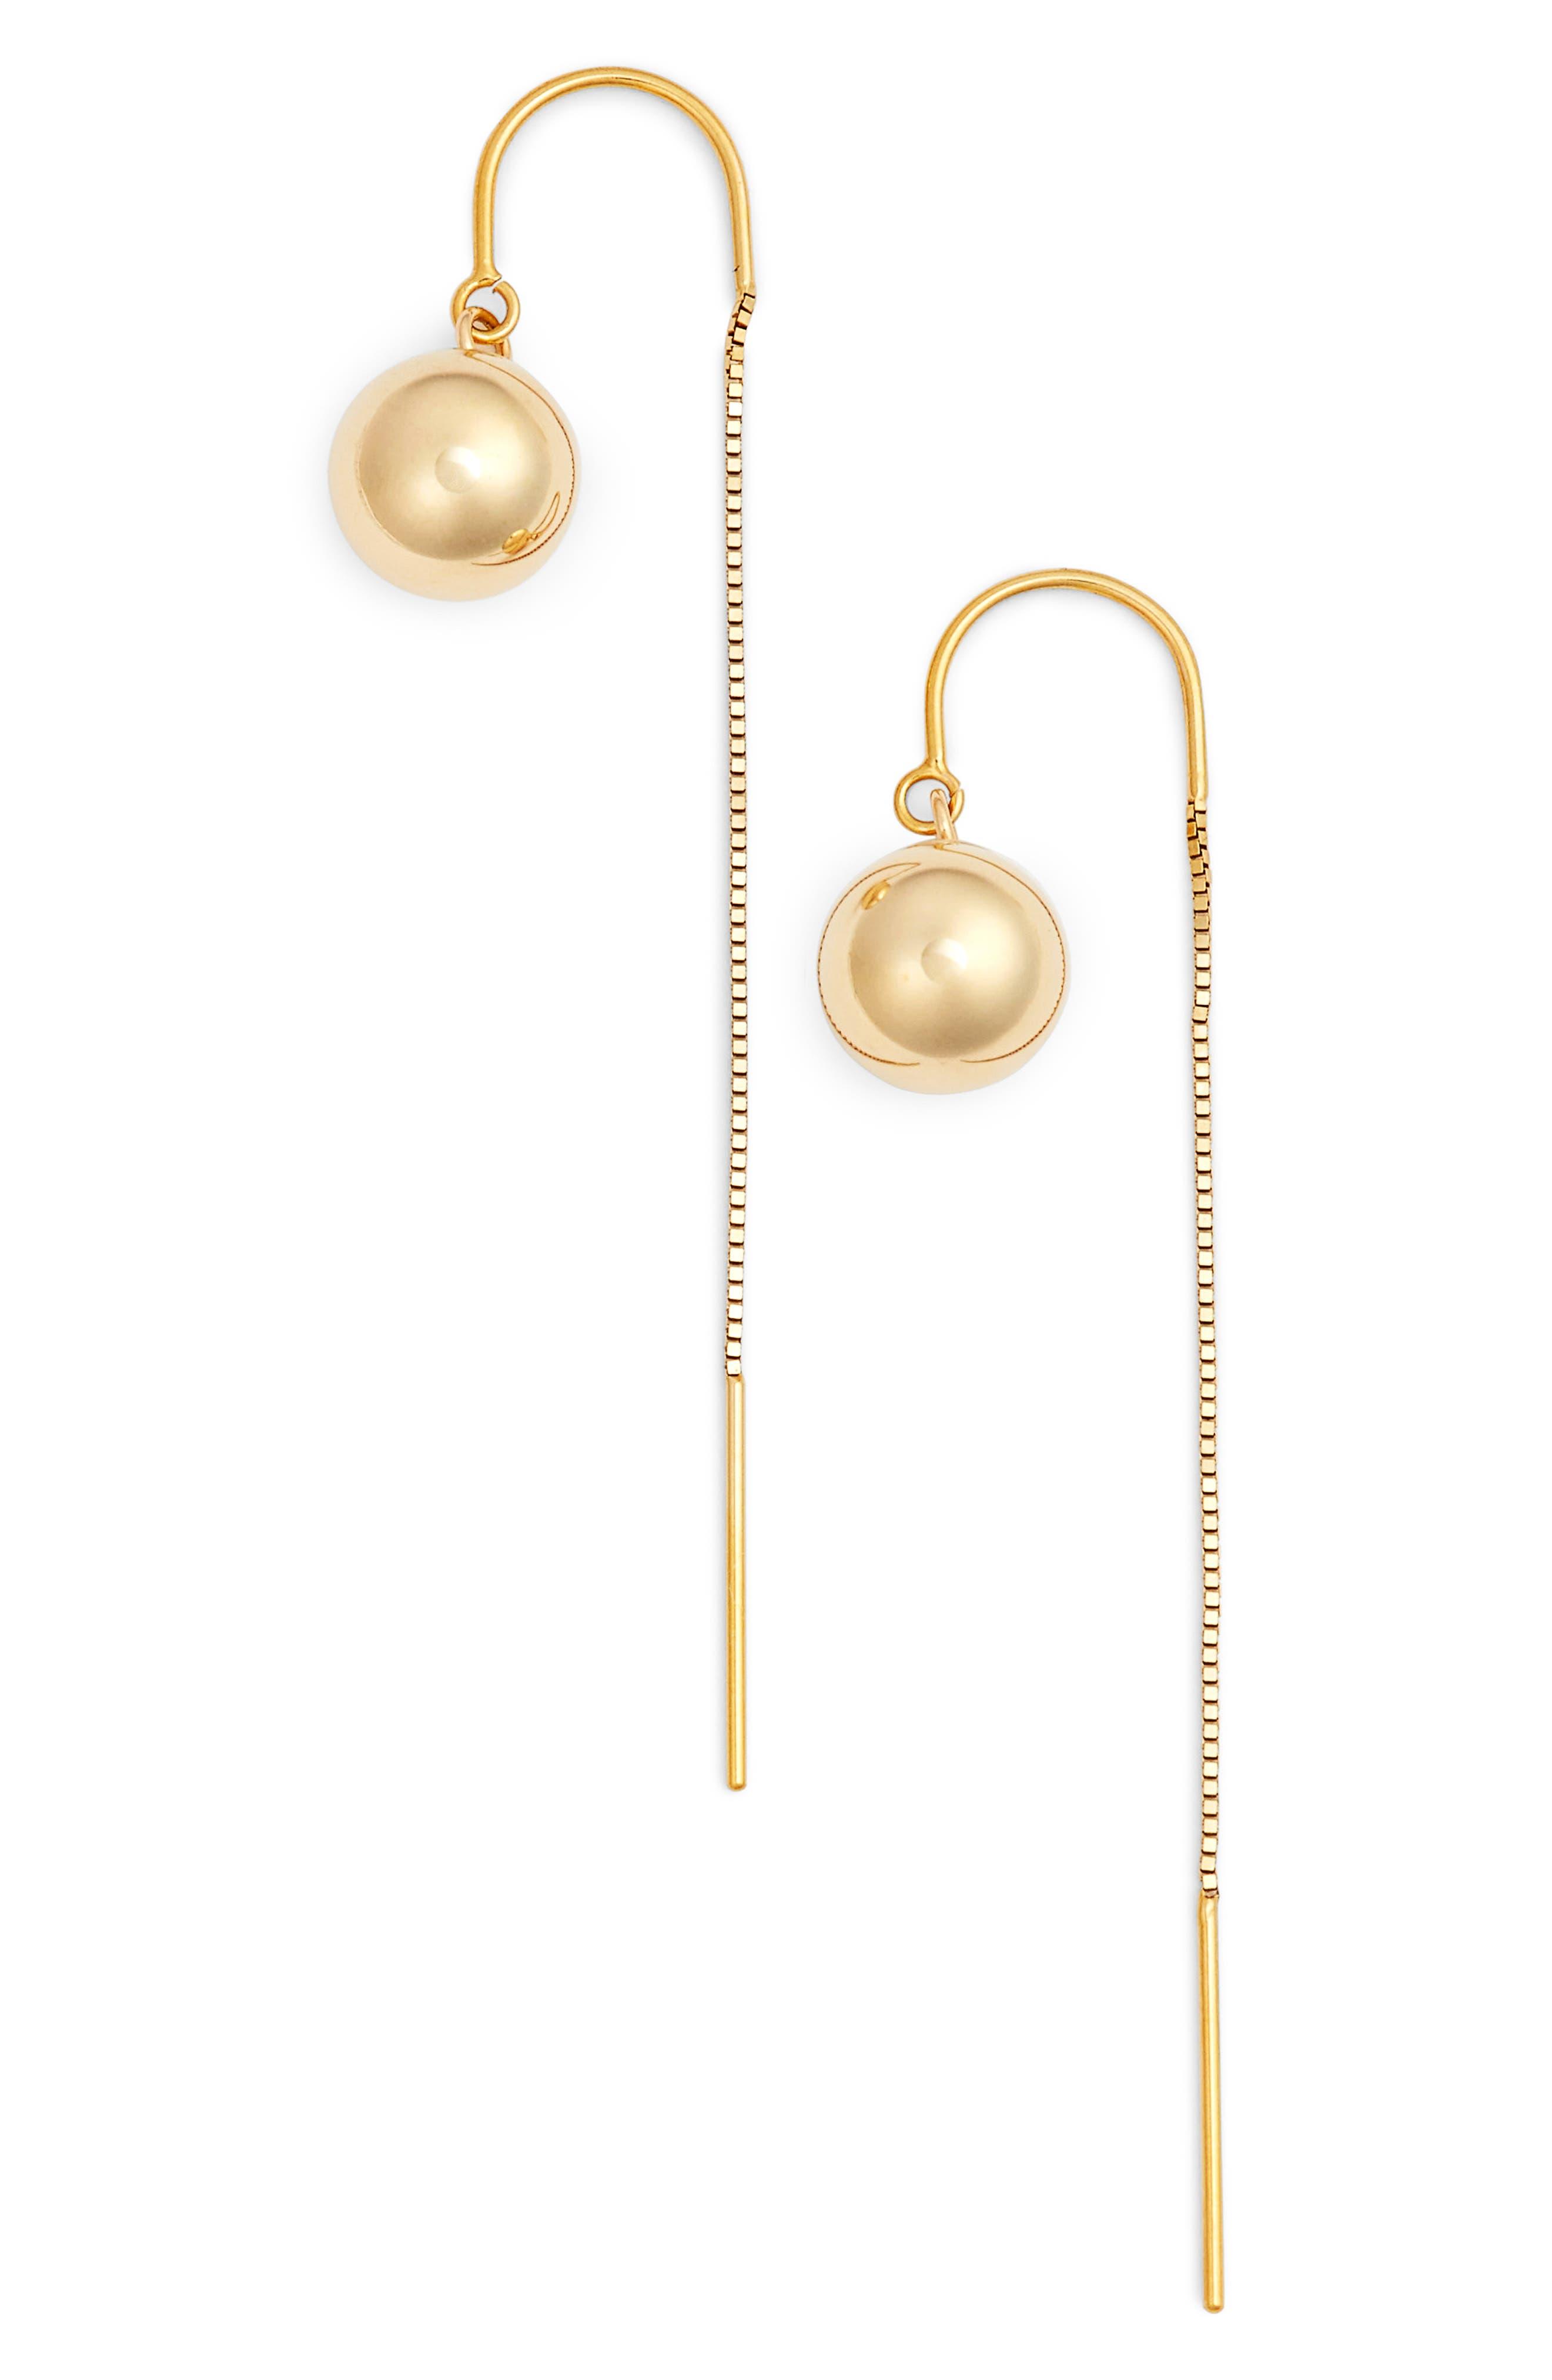 Gold Ball Threader Earrings,                             Main thumbnail 1, color,                             Yellow Gold